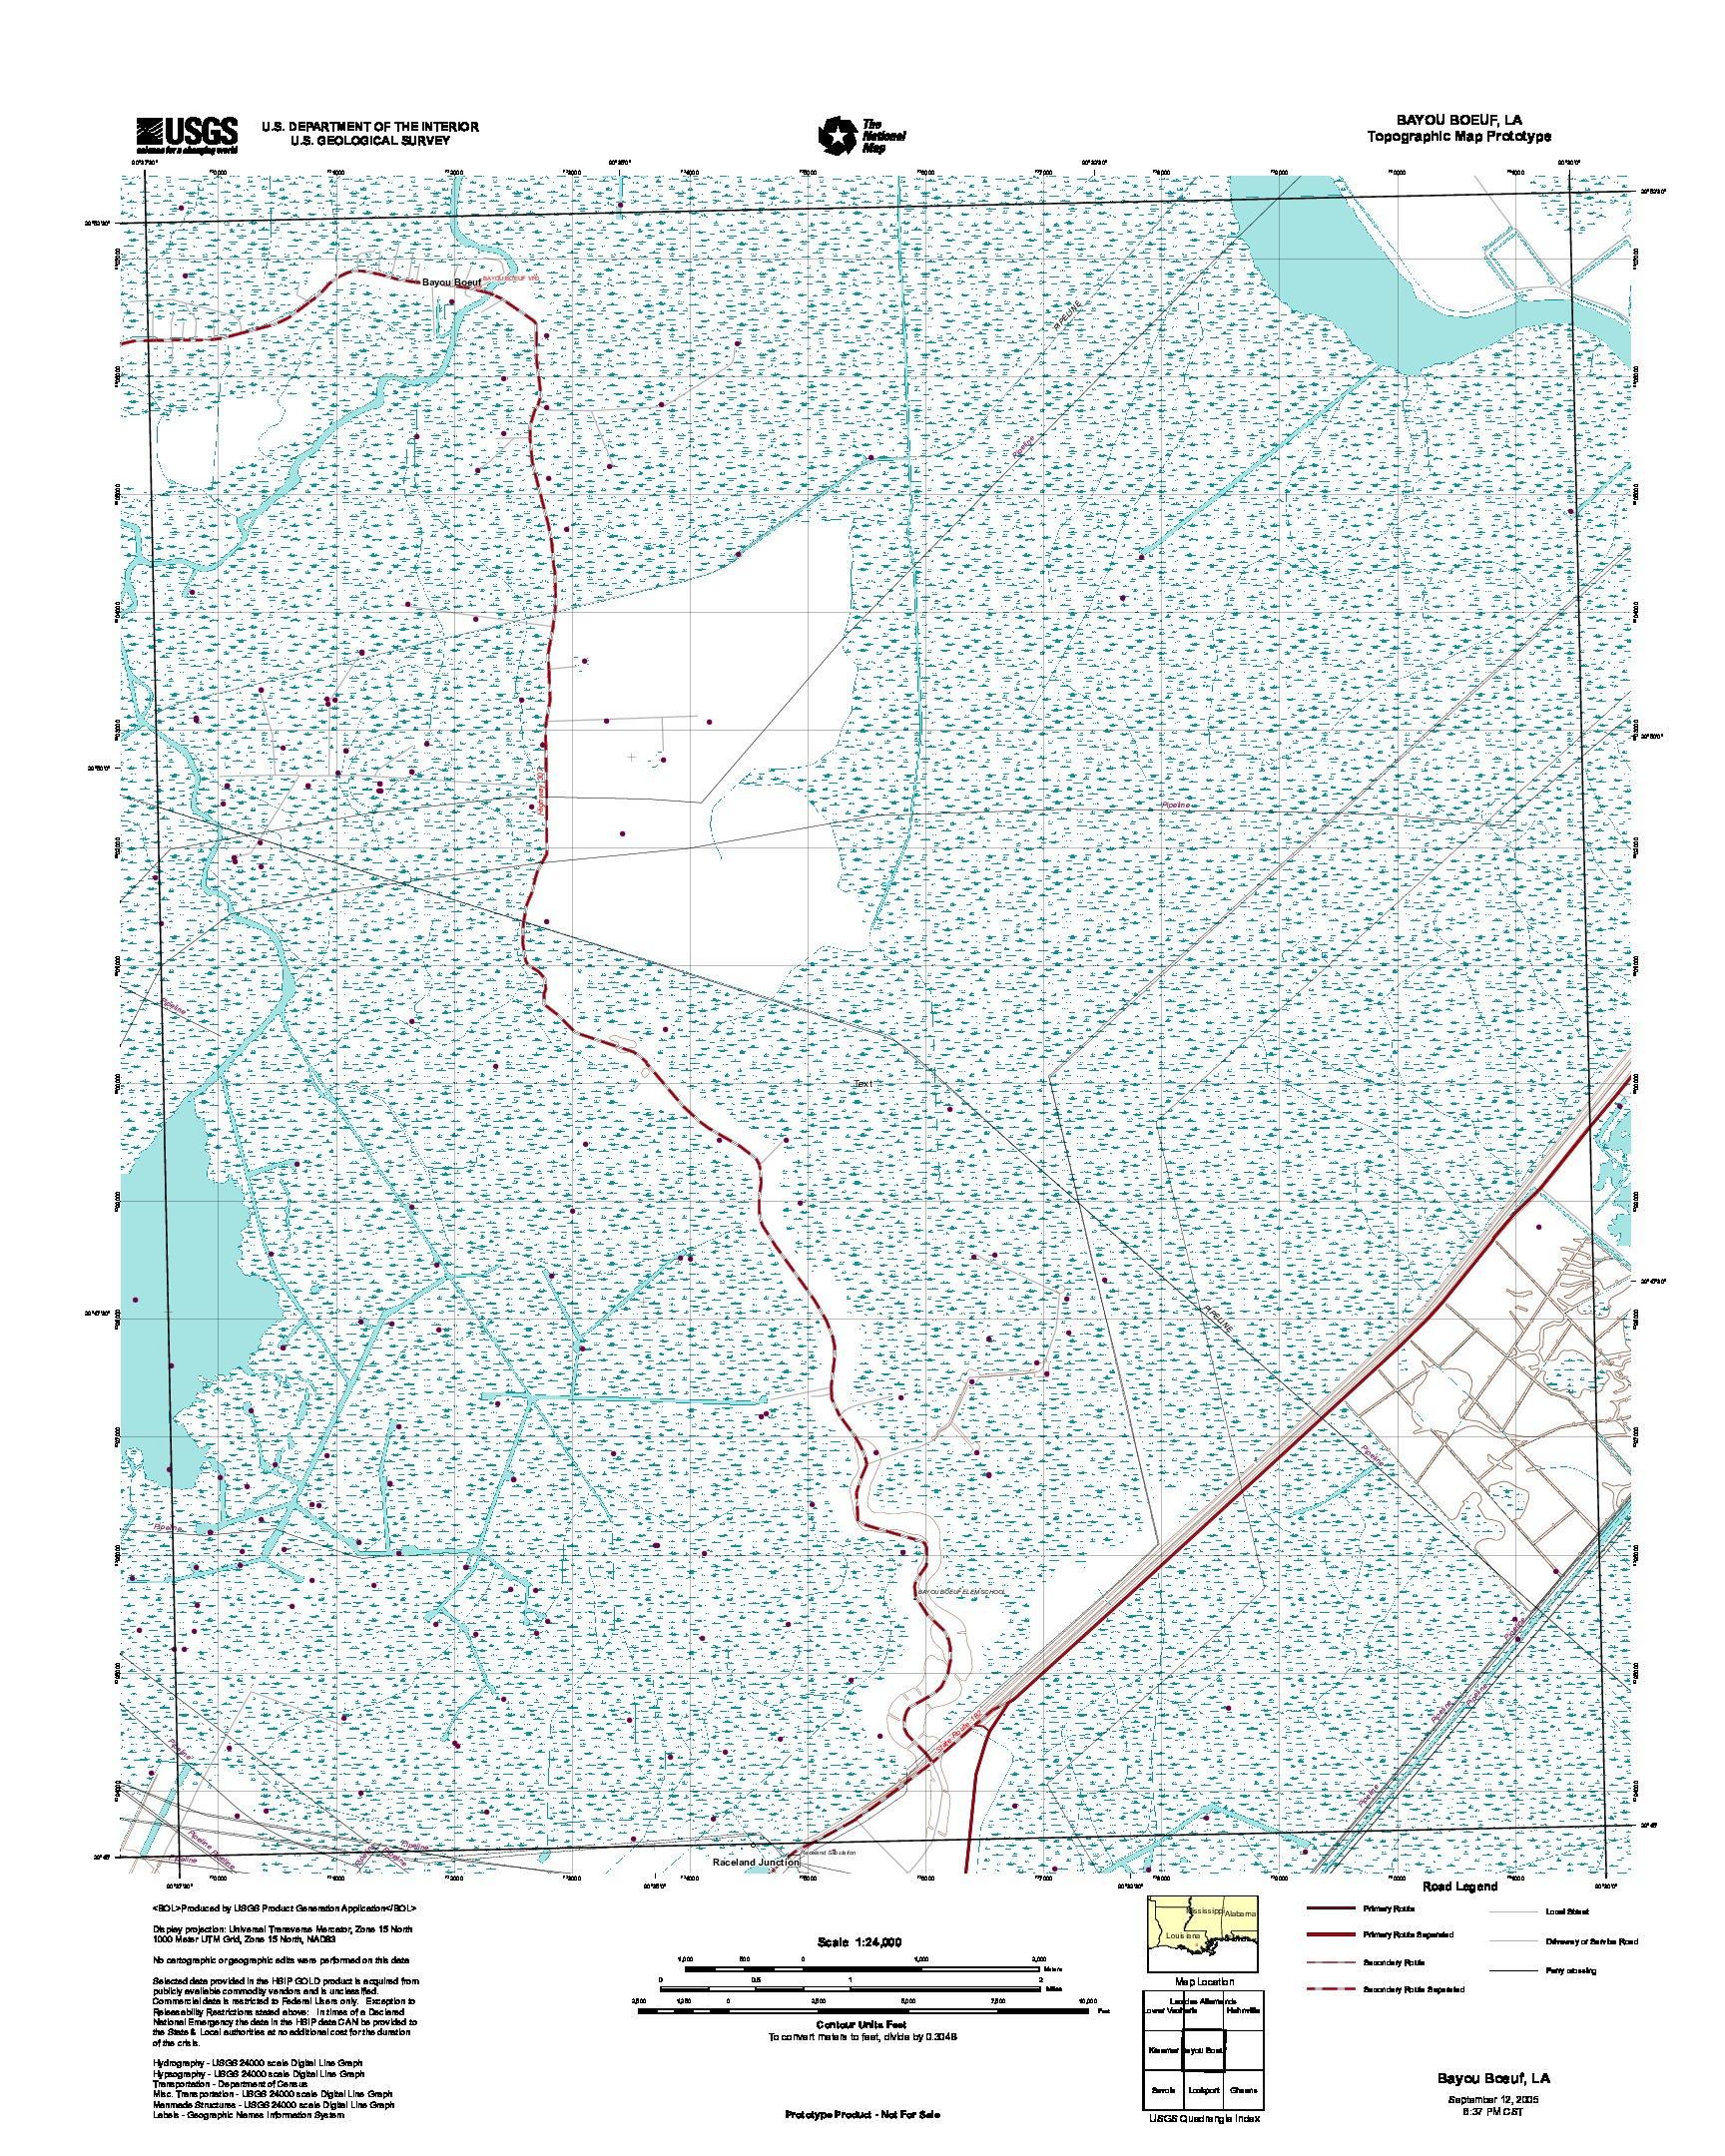 Prototipo de Mapa Topográfico de Bayou Boeuf, Luisiana, Estados Unidos, Septiembre 12, 2005